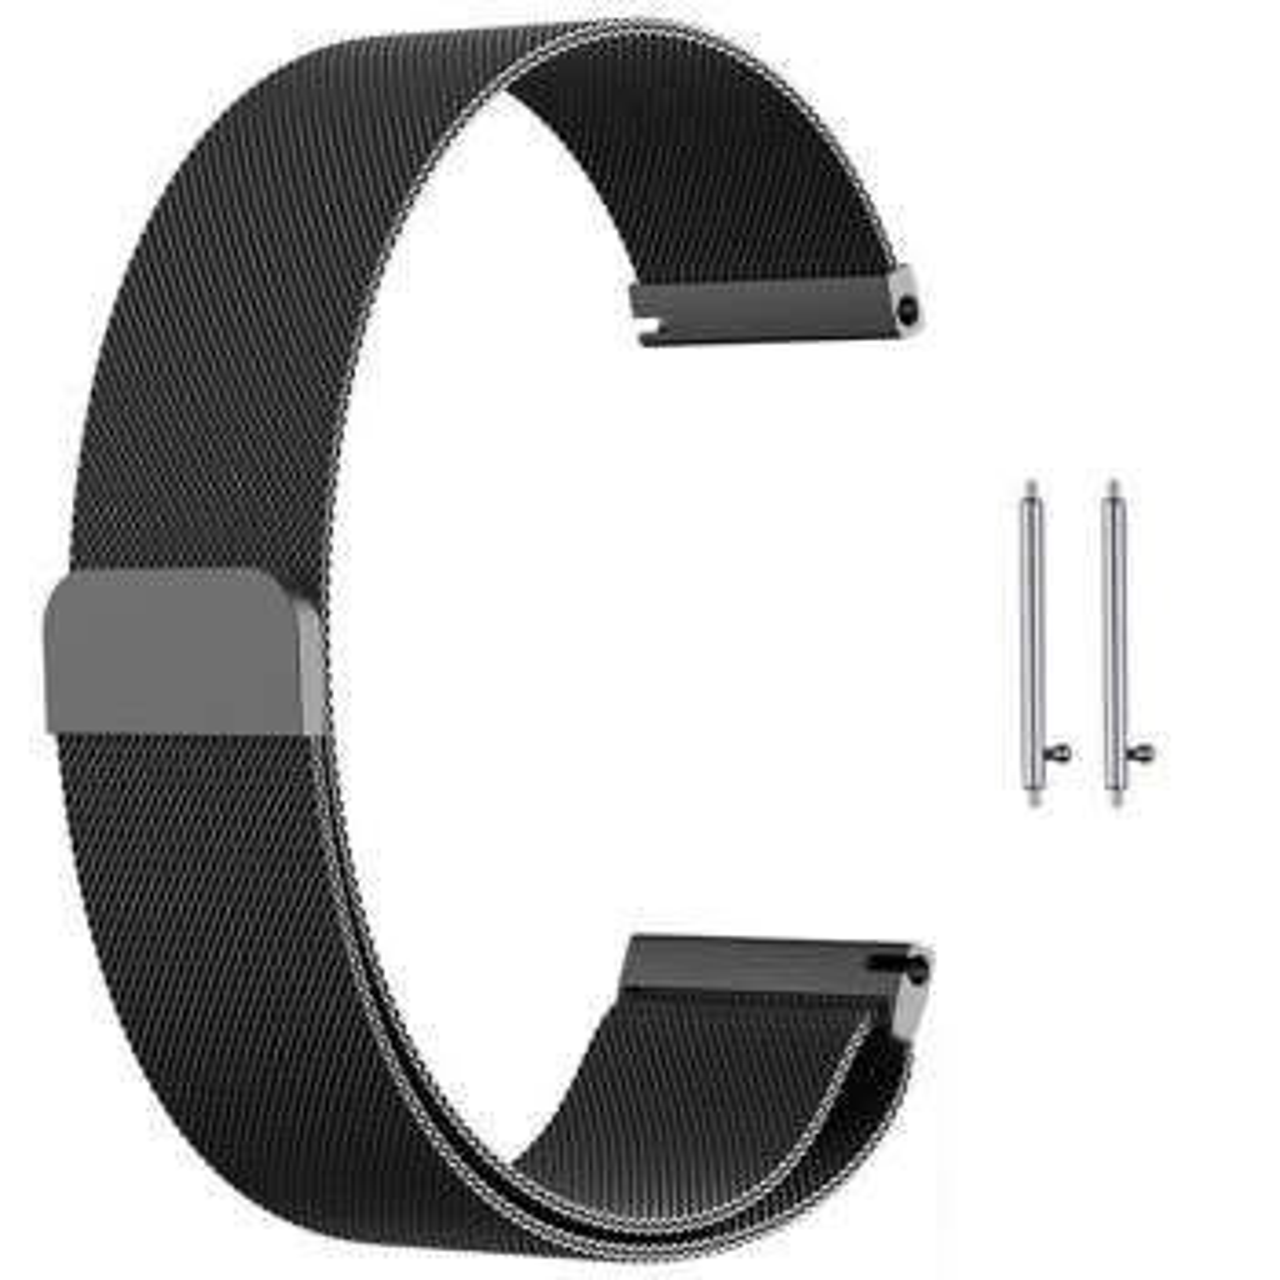 بند مدل Milanese Loop مناسب برای ساعت هوشمند سامسونگ Gear S2 Classic / Gear Sport |